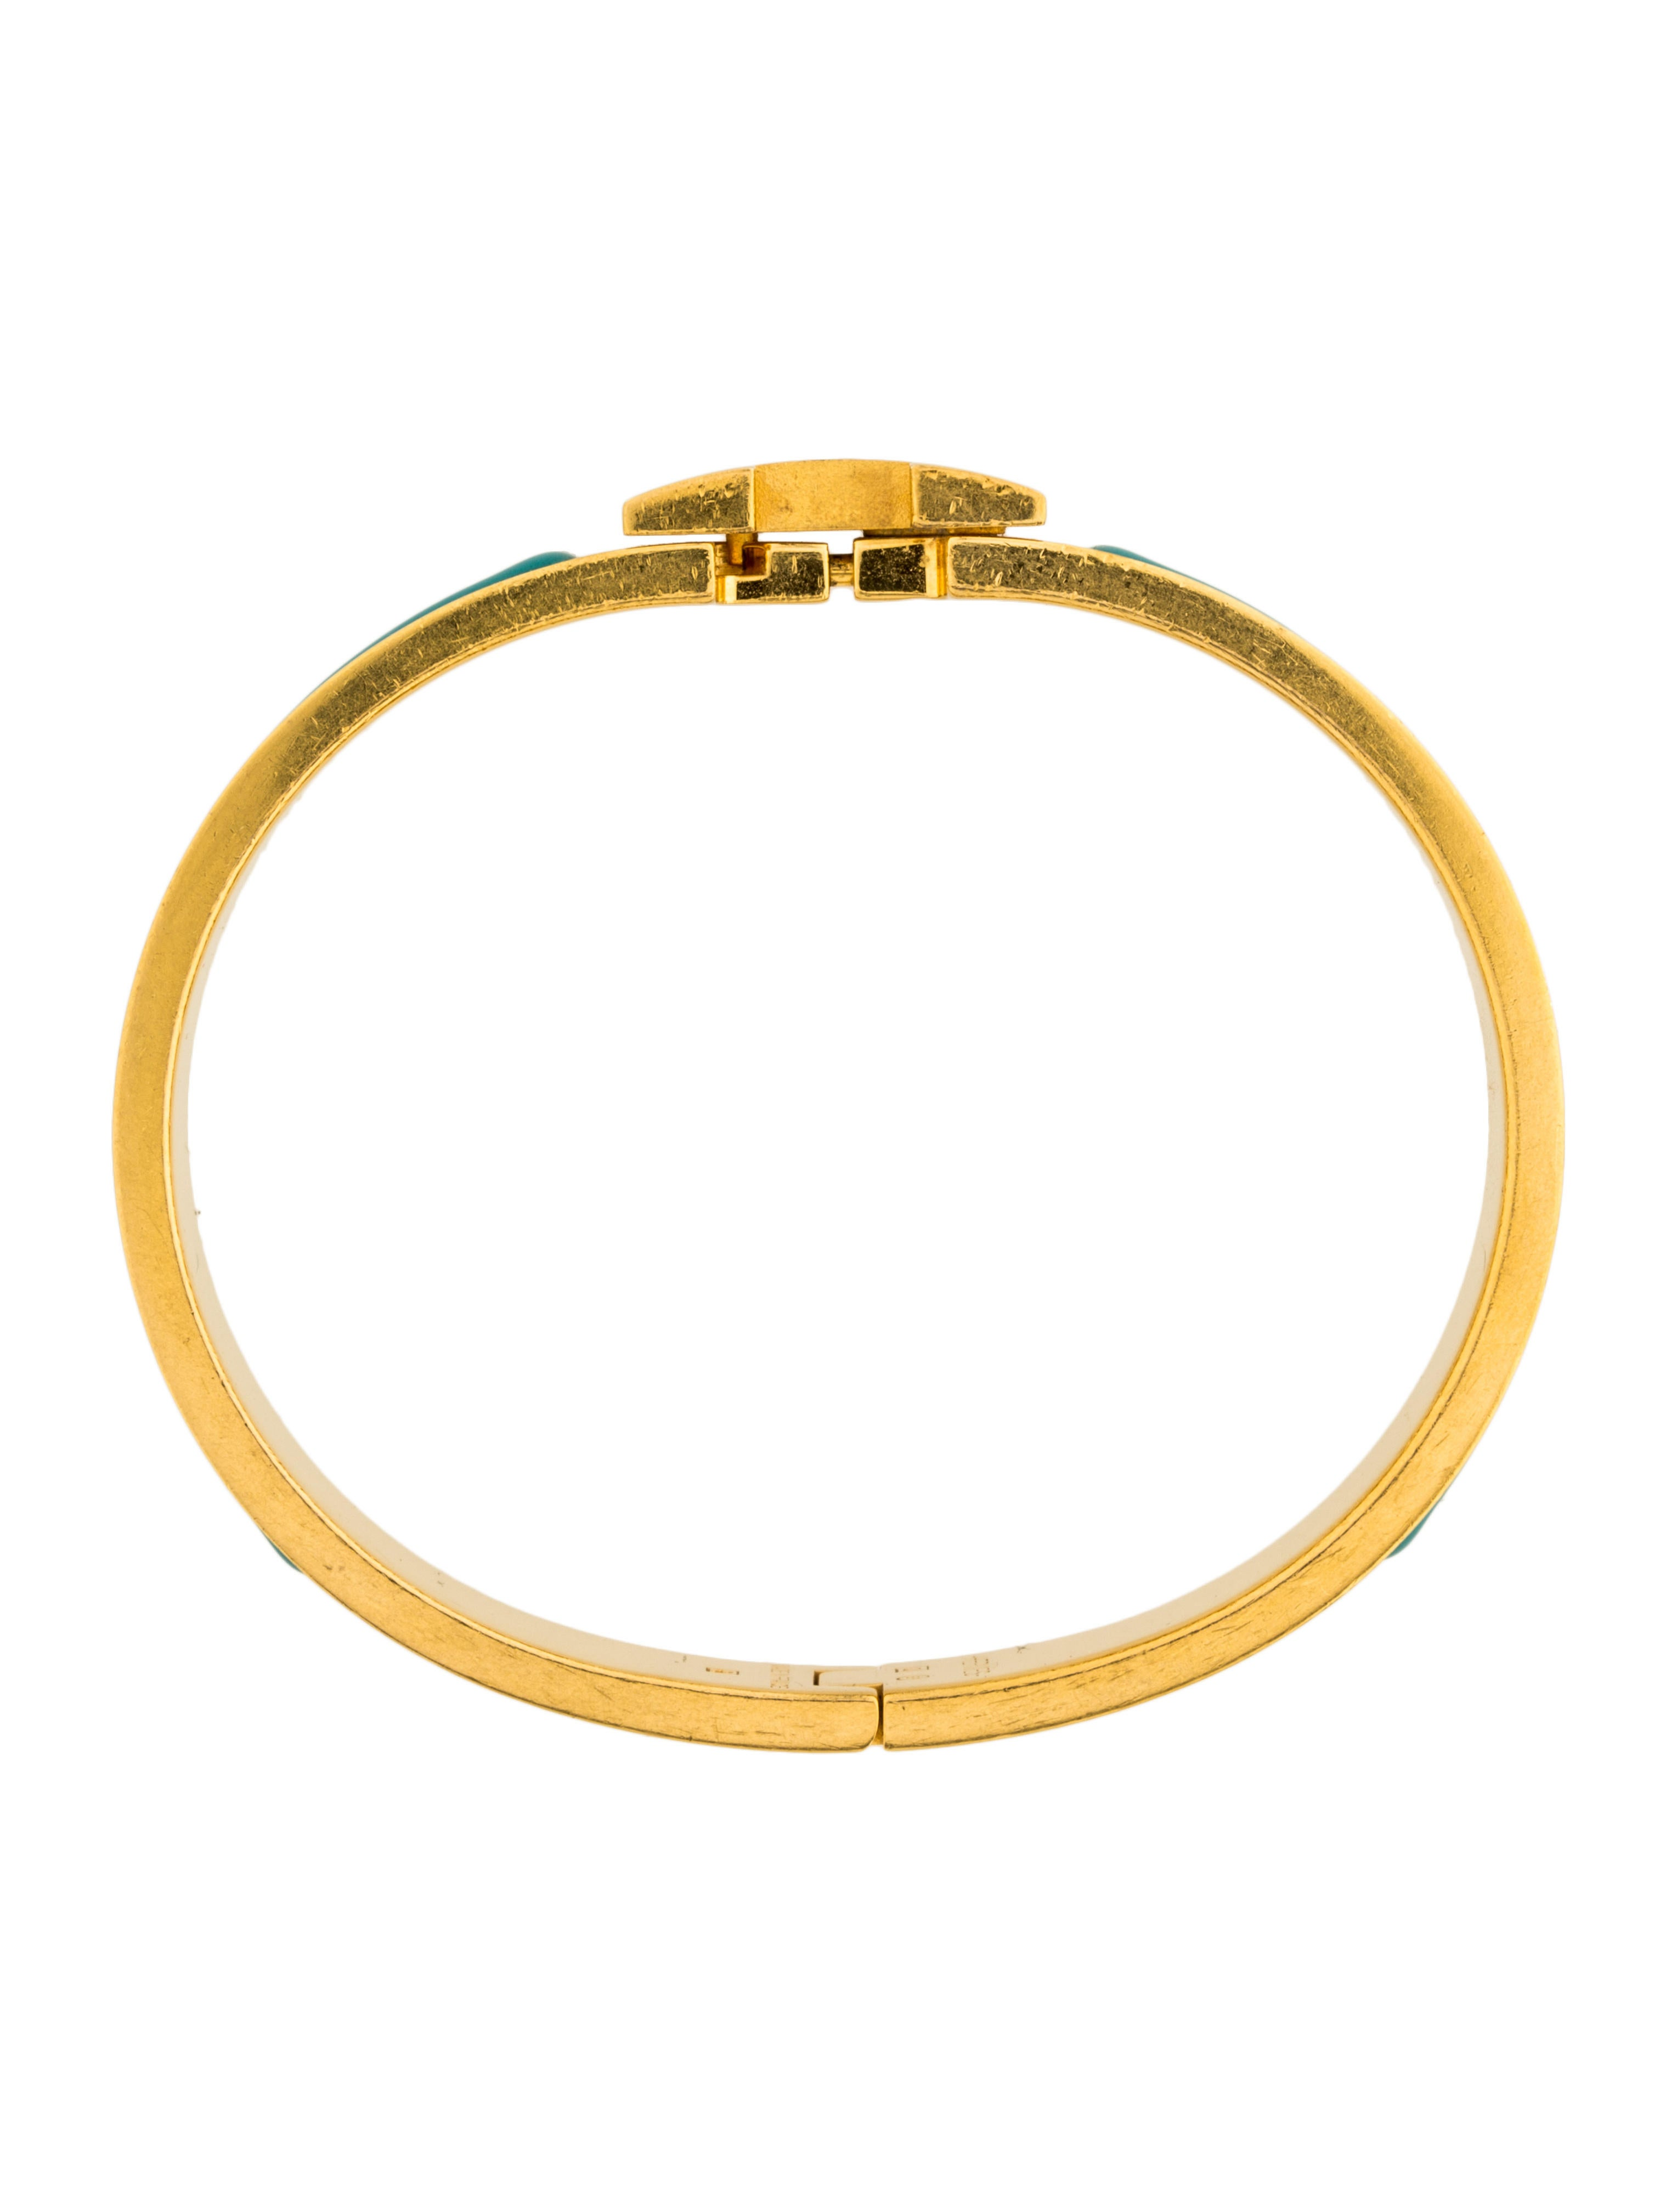 herm s gm narrow clic clac h bracelet bracelets. Black Bedroom Furniture Sets. Home Design Ideas